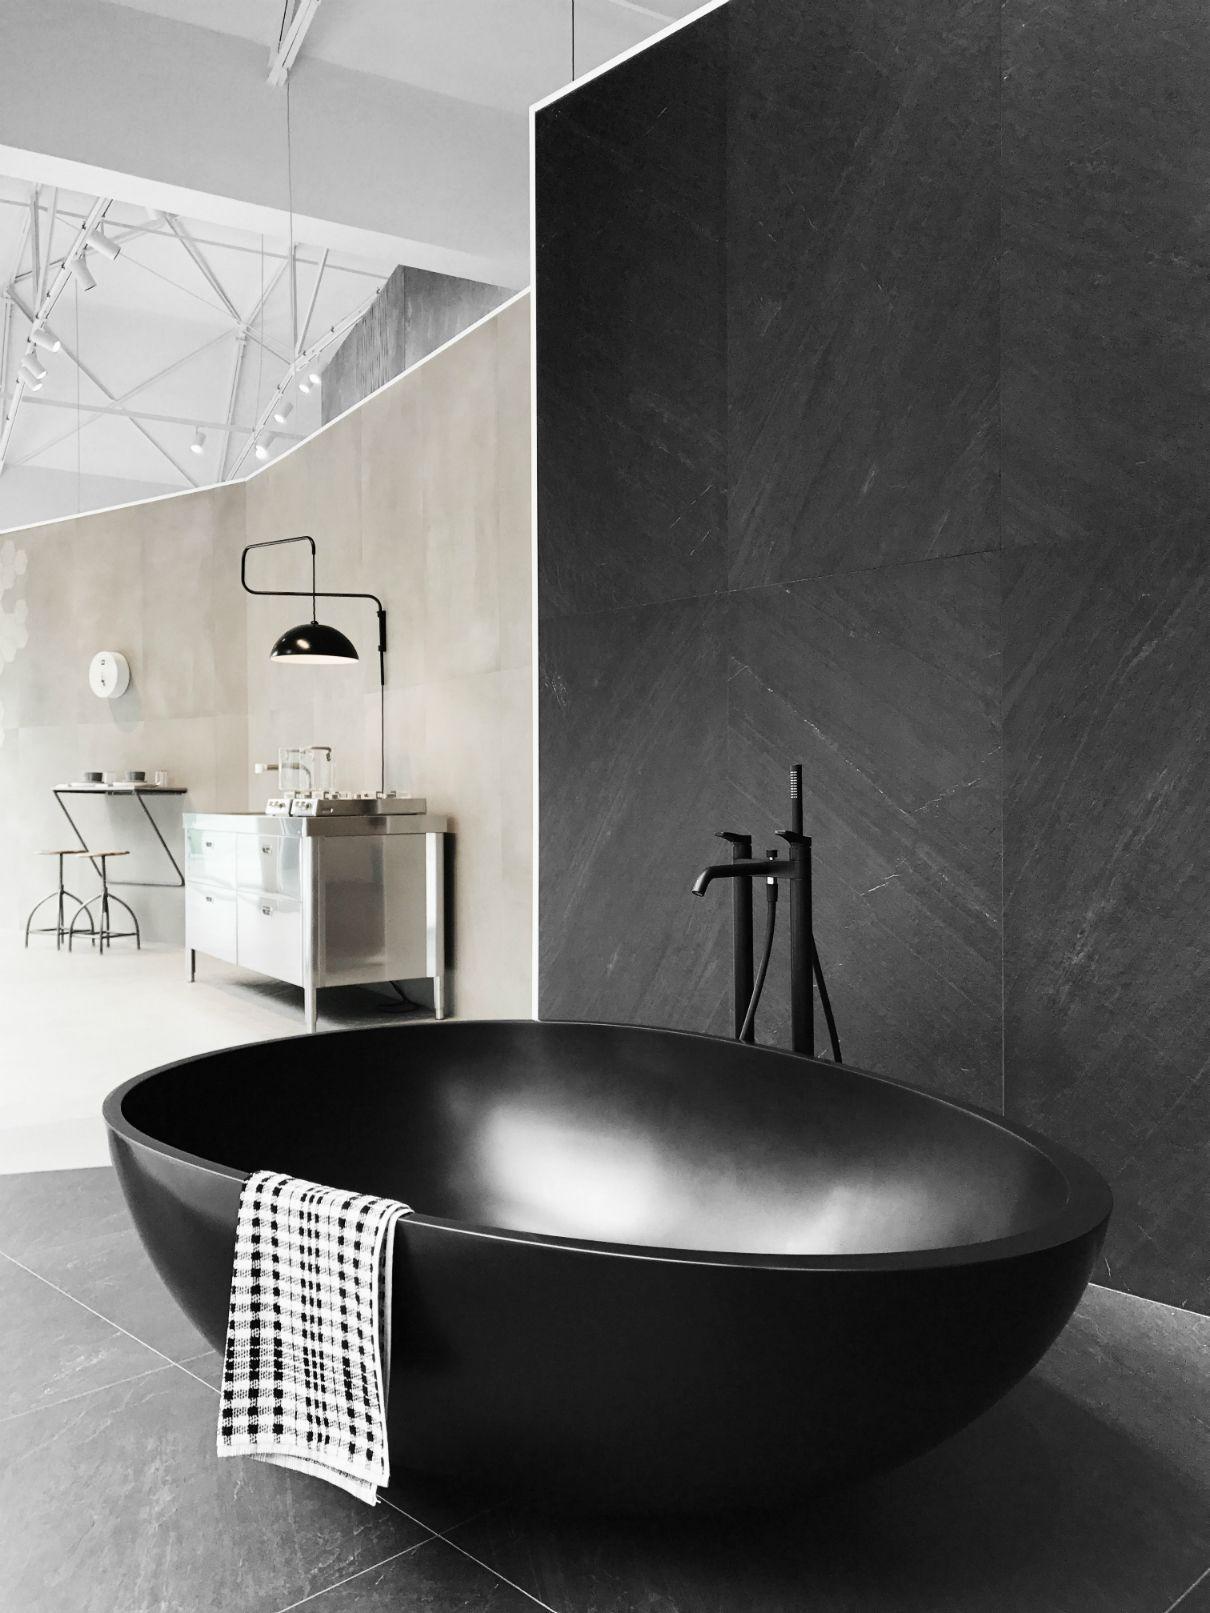 Marazzi Bathtub By Mastella Available At Snyder Diamond In Los